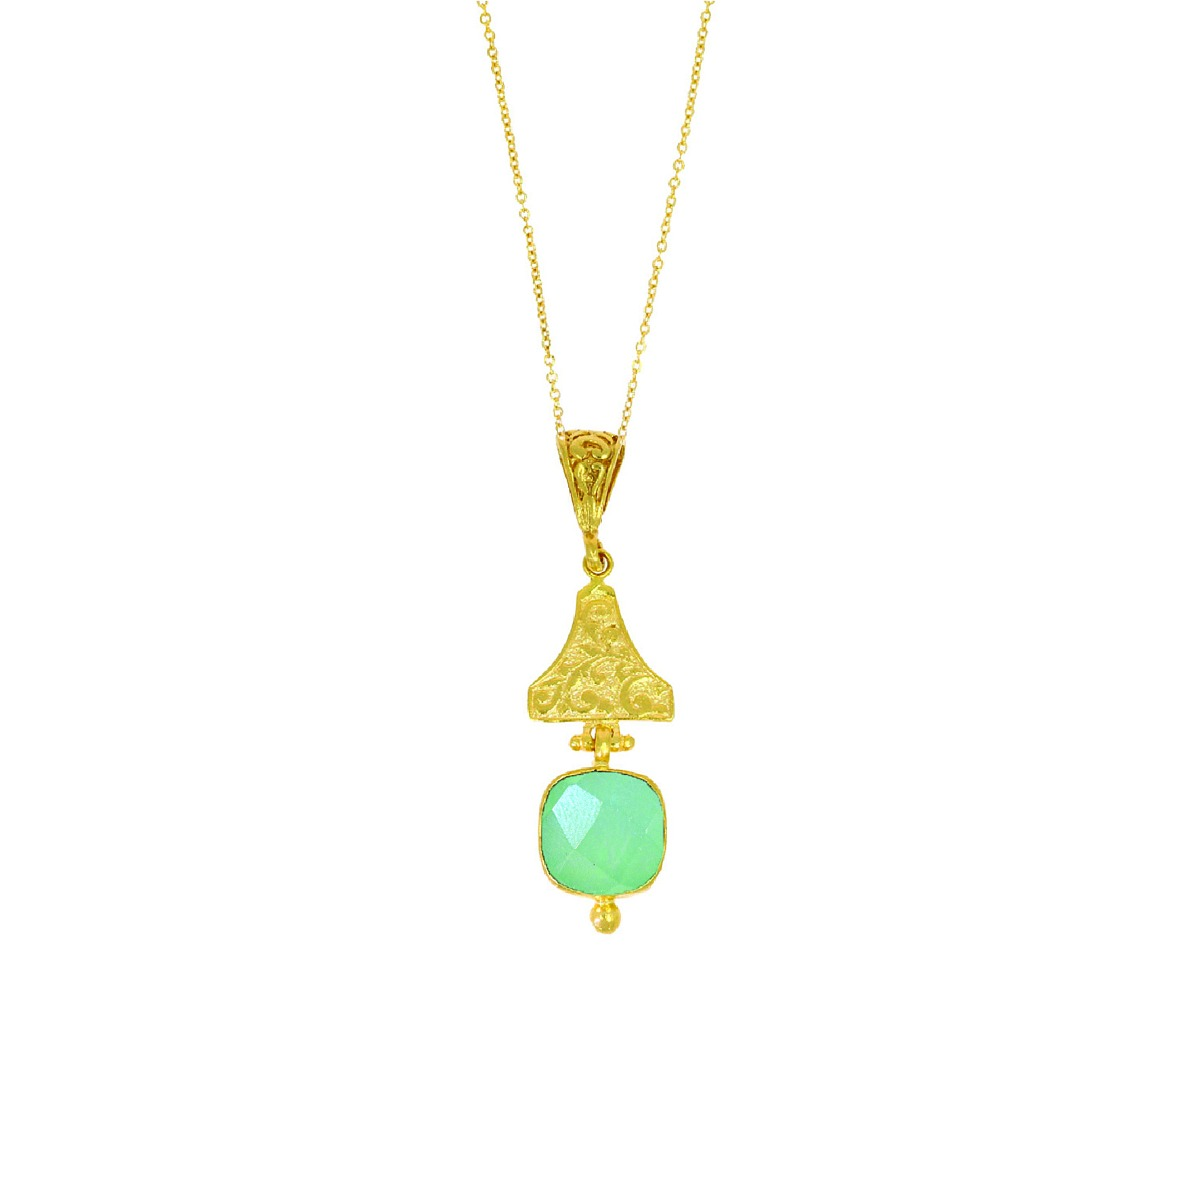 Aqua chalcedon necklace